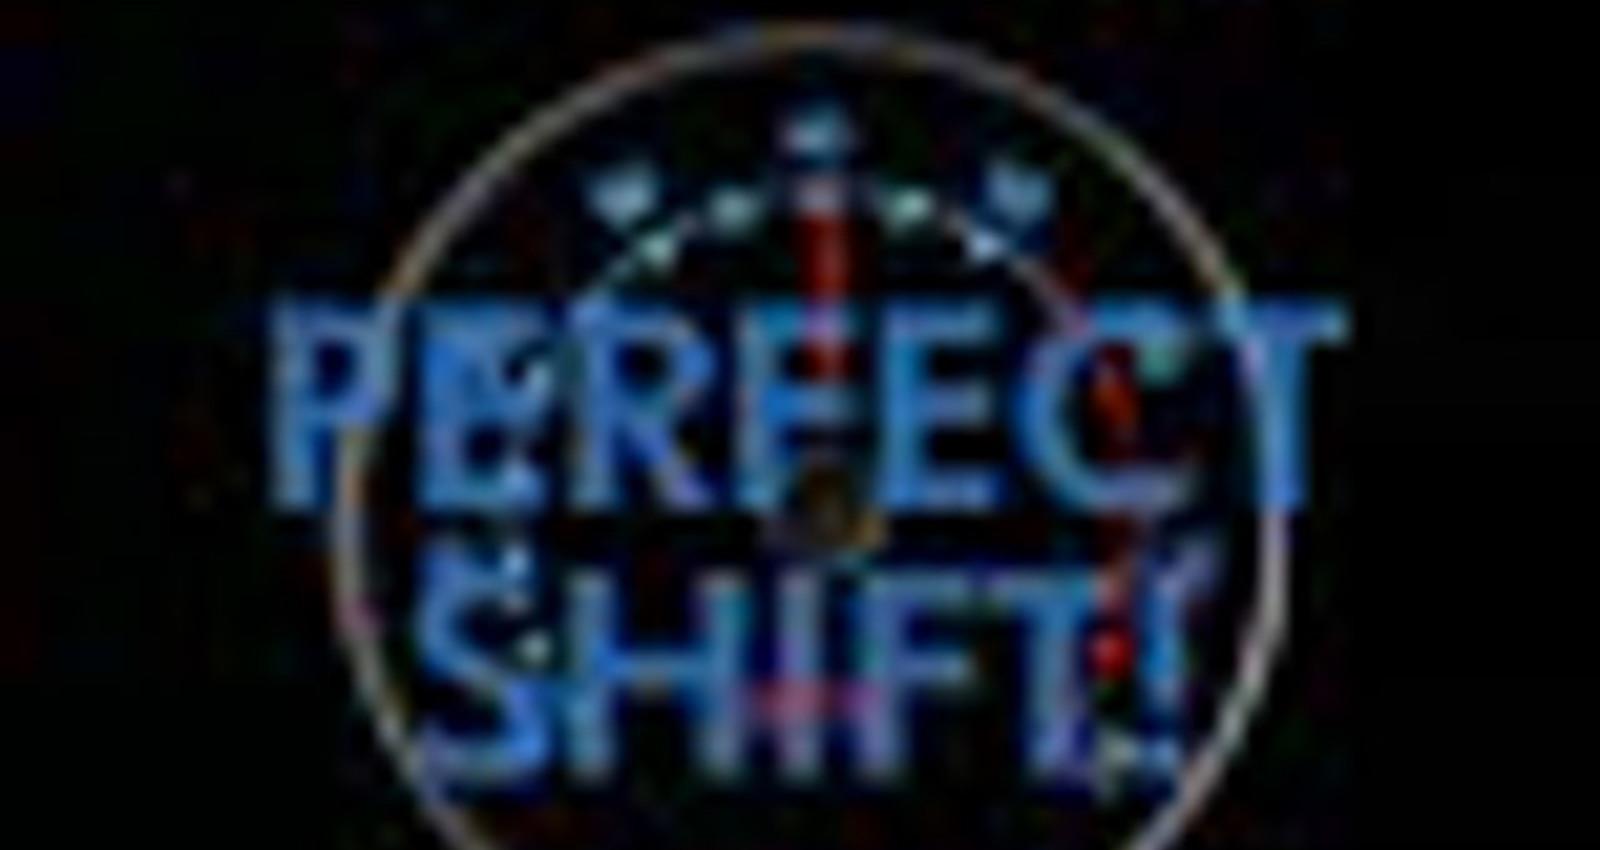 GTI Paddleshift Banner